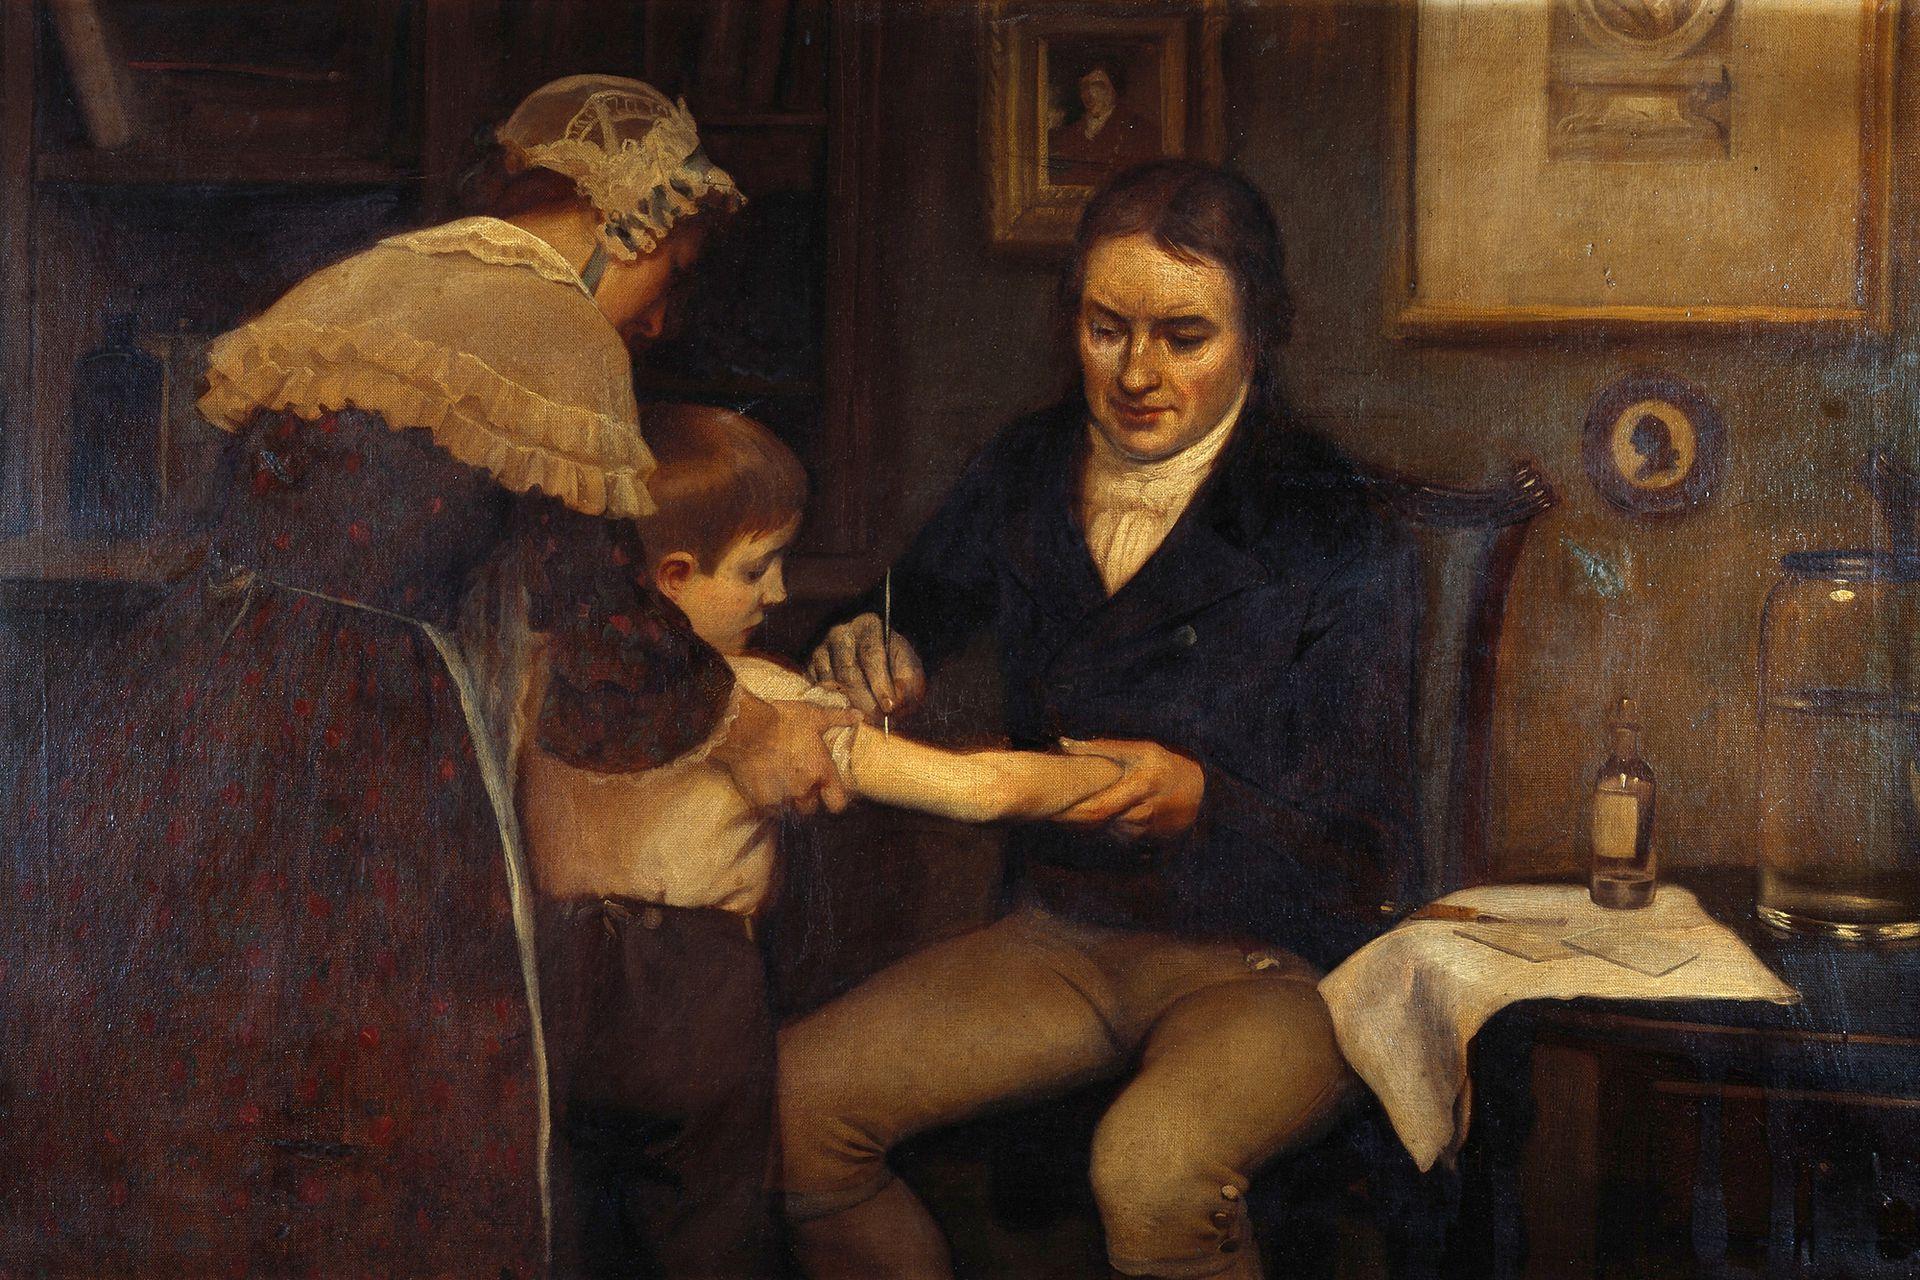 En 1796, el inglés Edward Jenner logró grandes avances en la vacuna contra la viruela